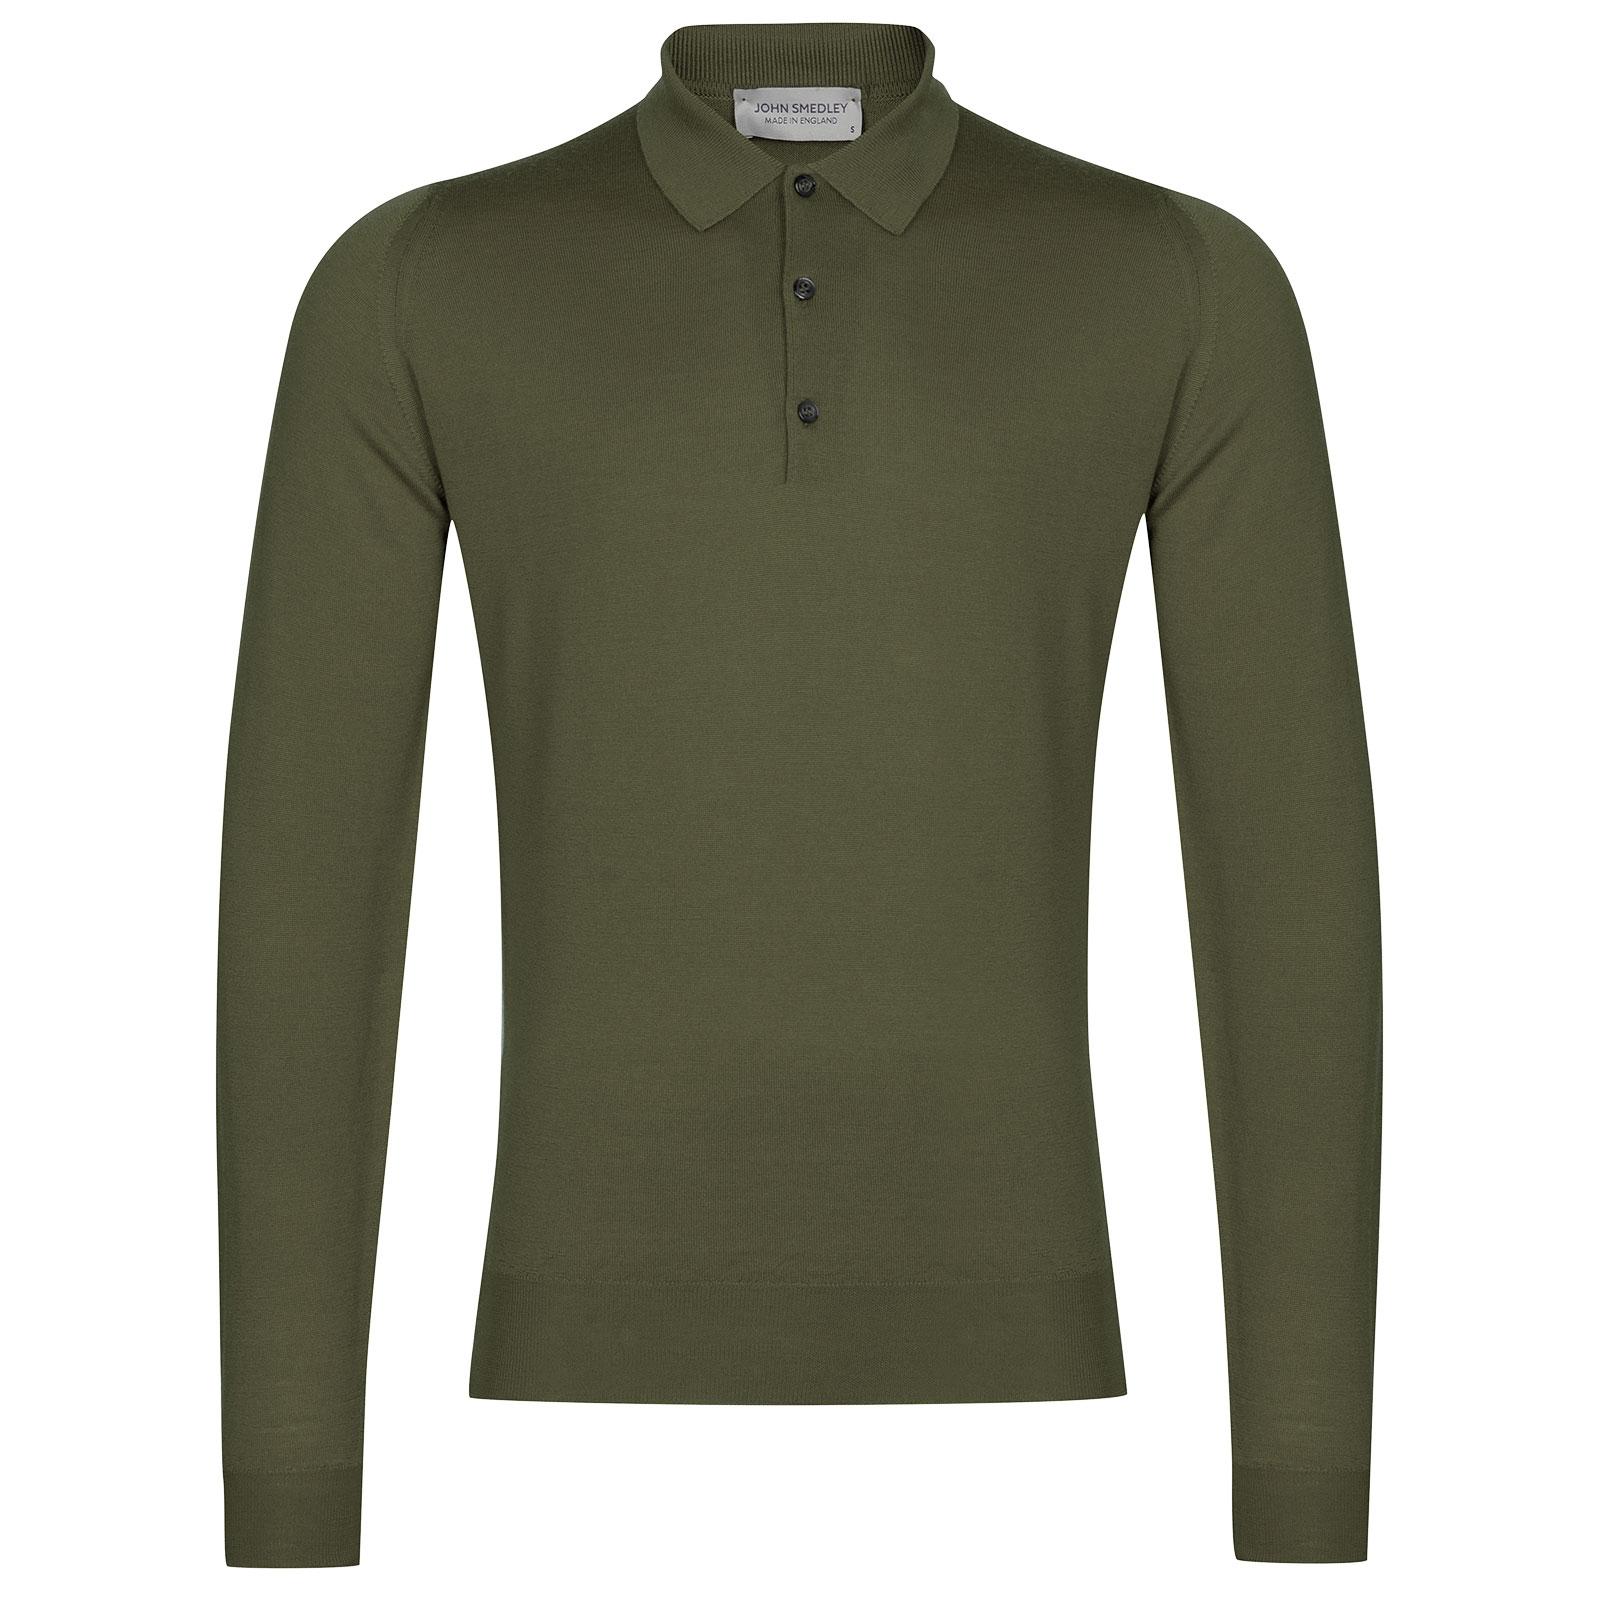 John Smedley Belper in Sepal Green Shirt-MED